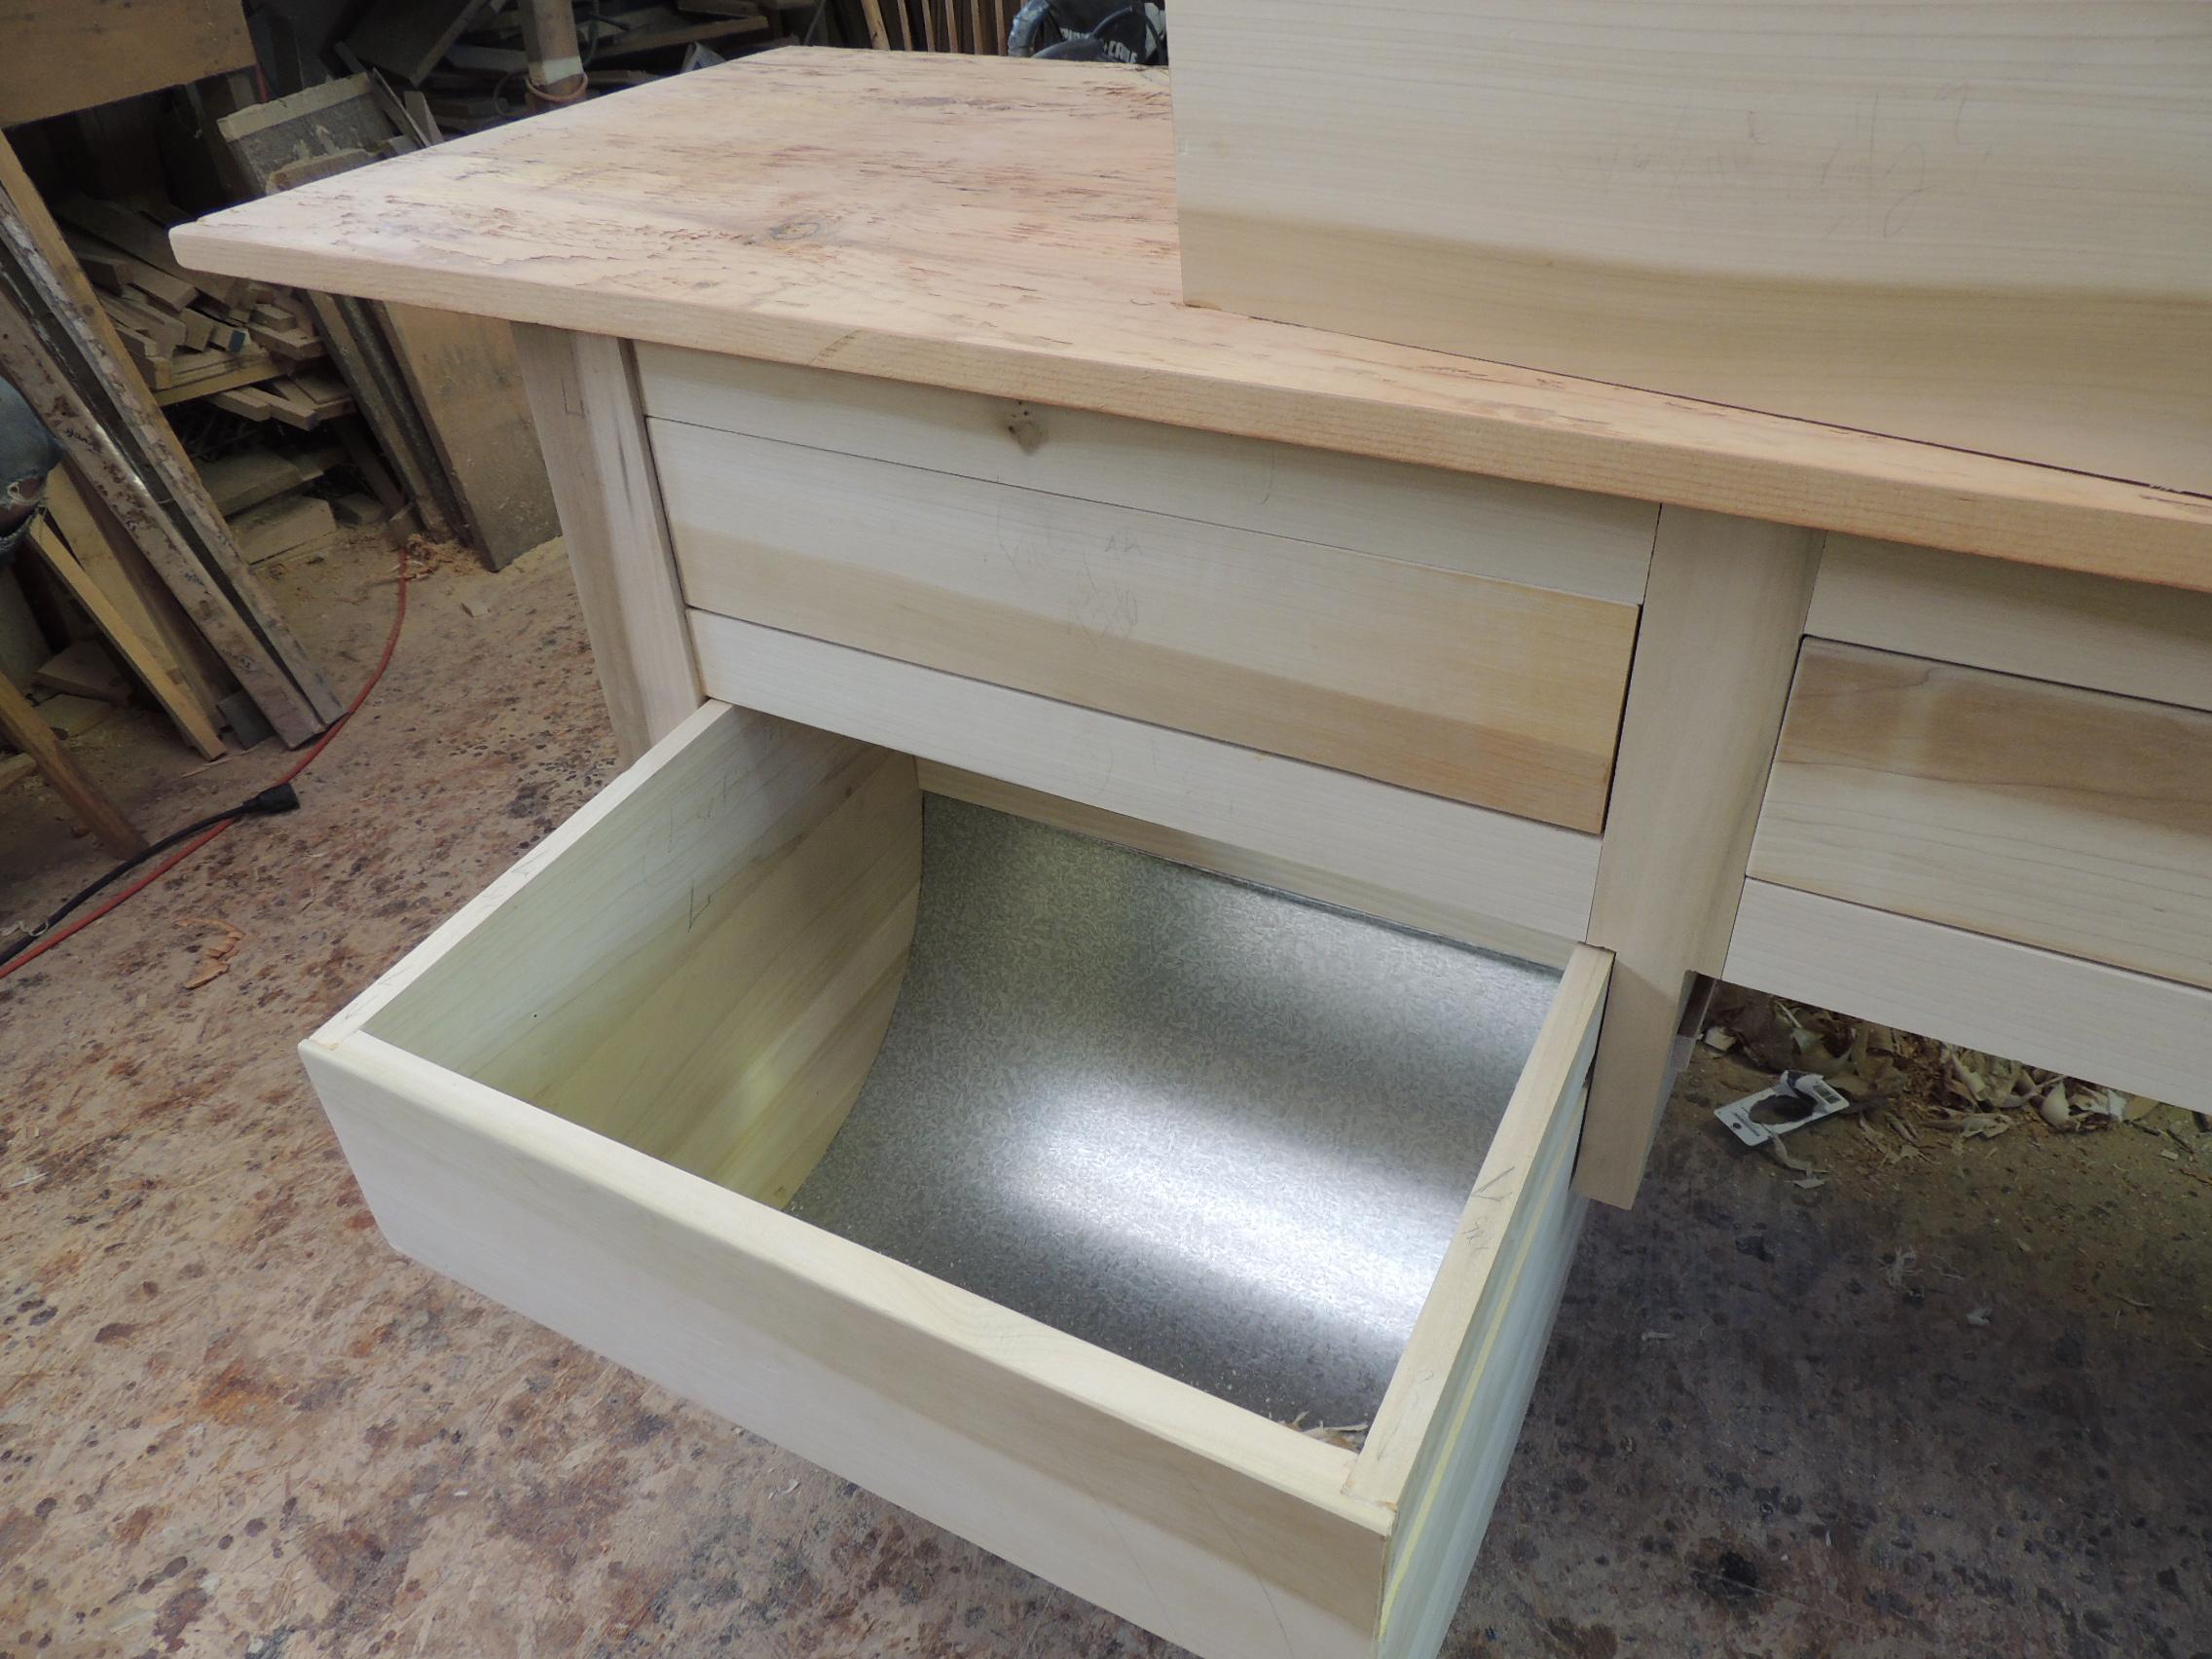 galvanized steel bottom drawers